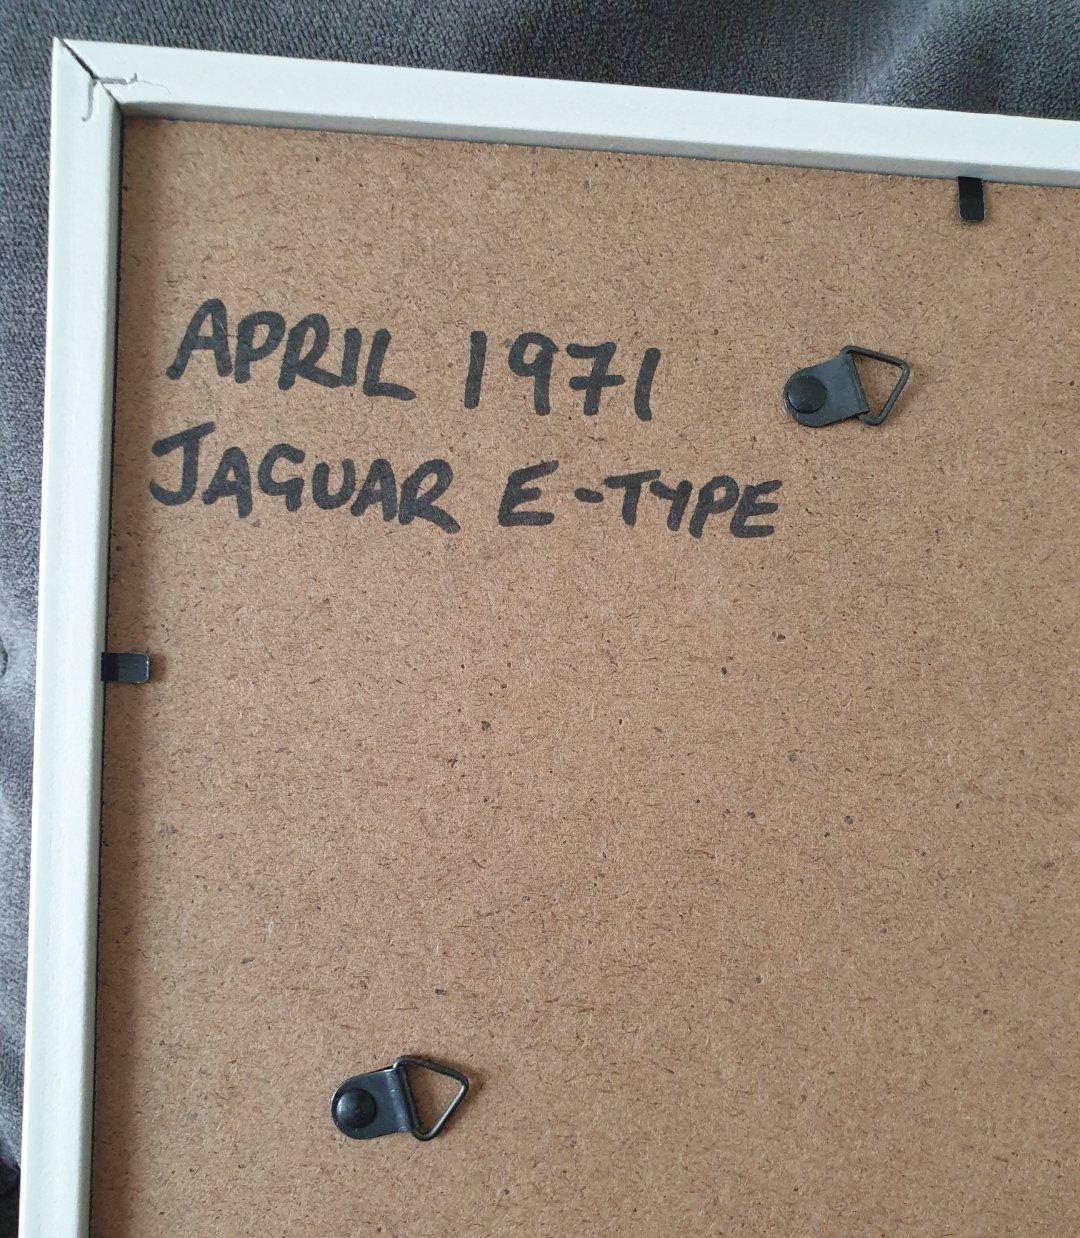 1971 Jaguar E-type advert Original  For Sale (picture 2 of 2)